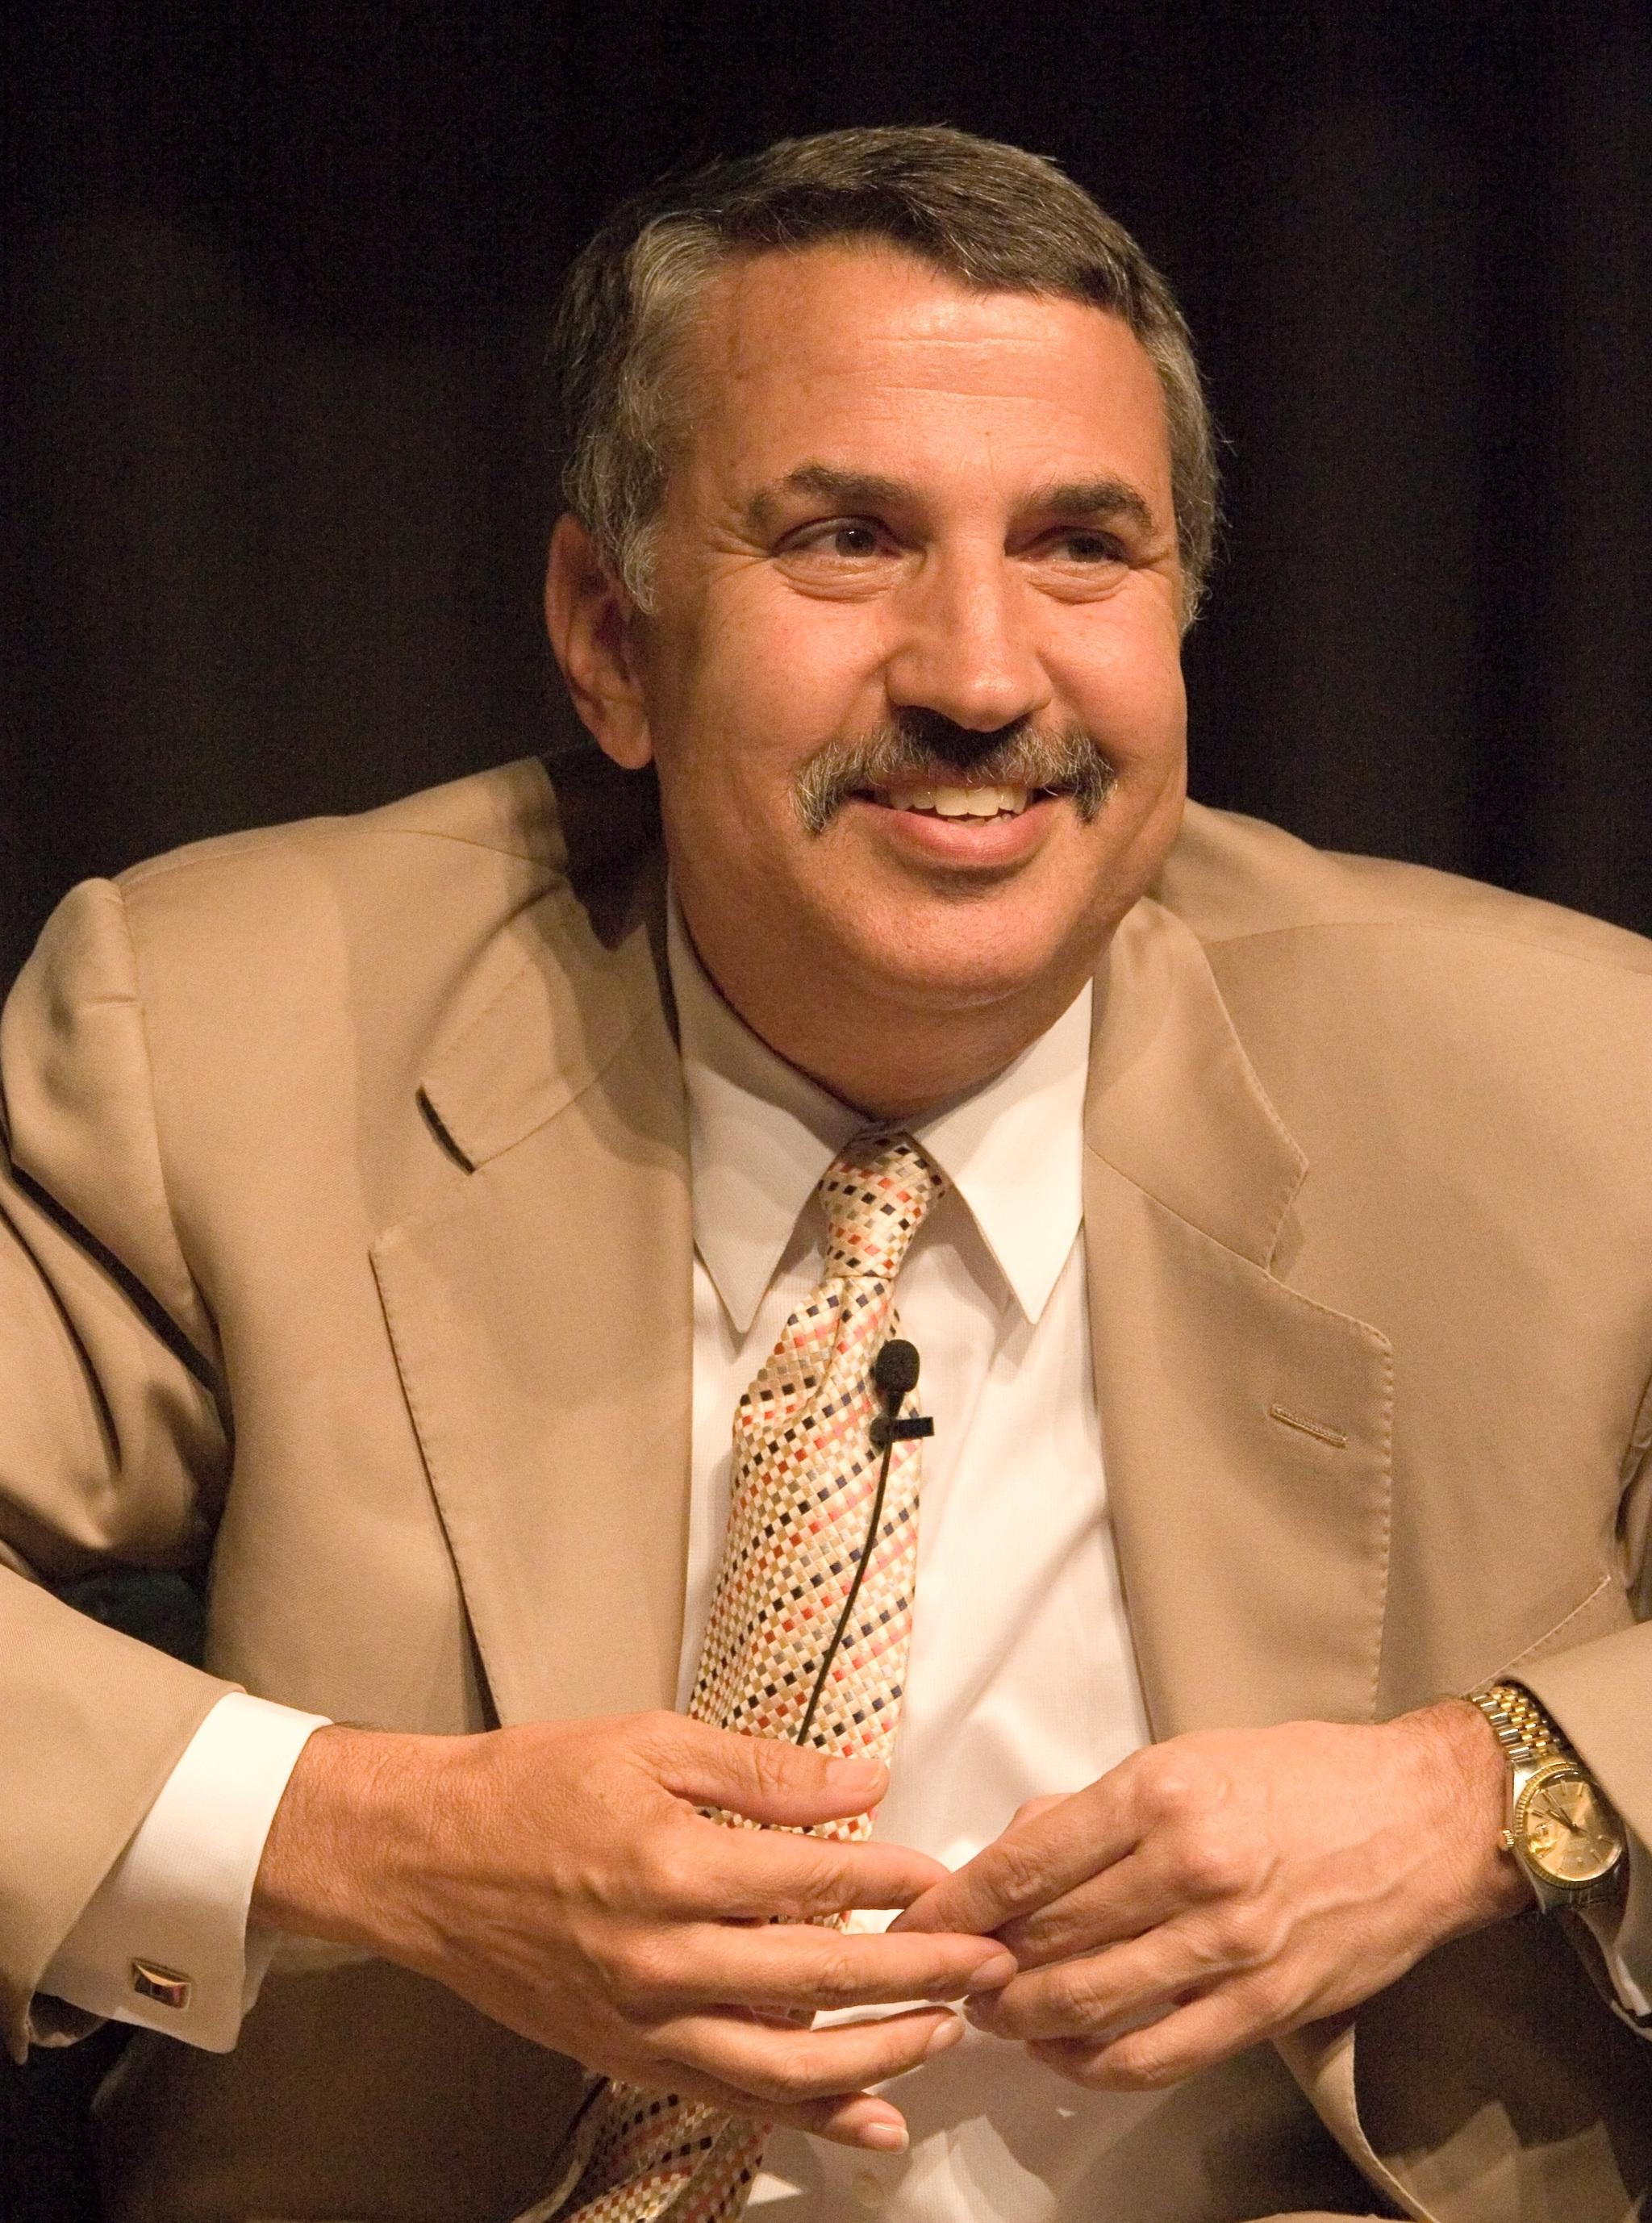 Portrait of Thomas Friedman